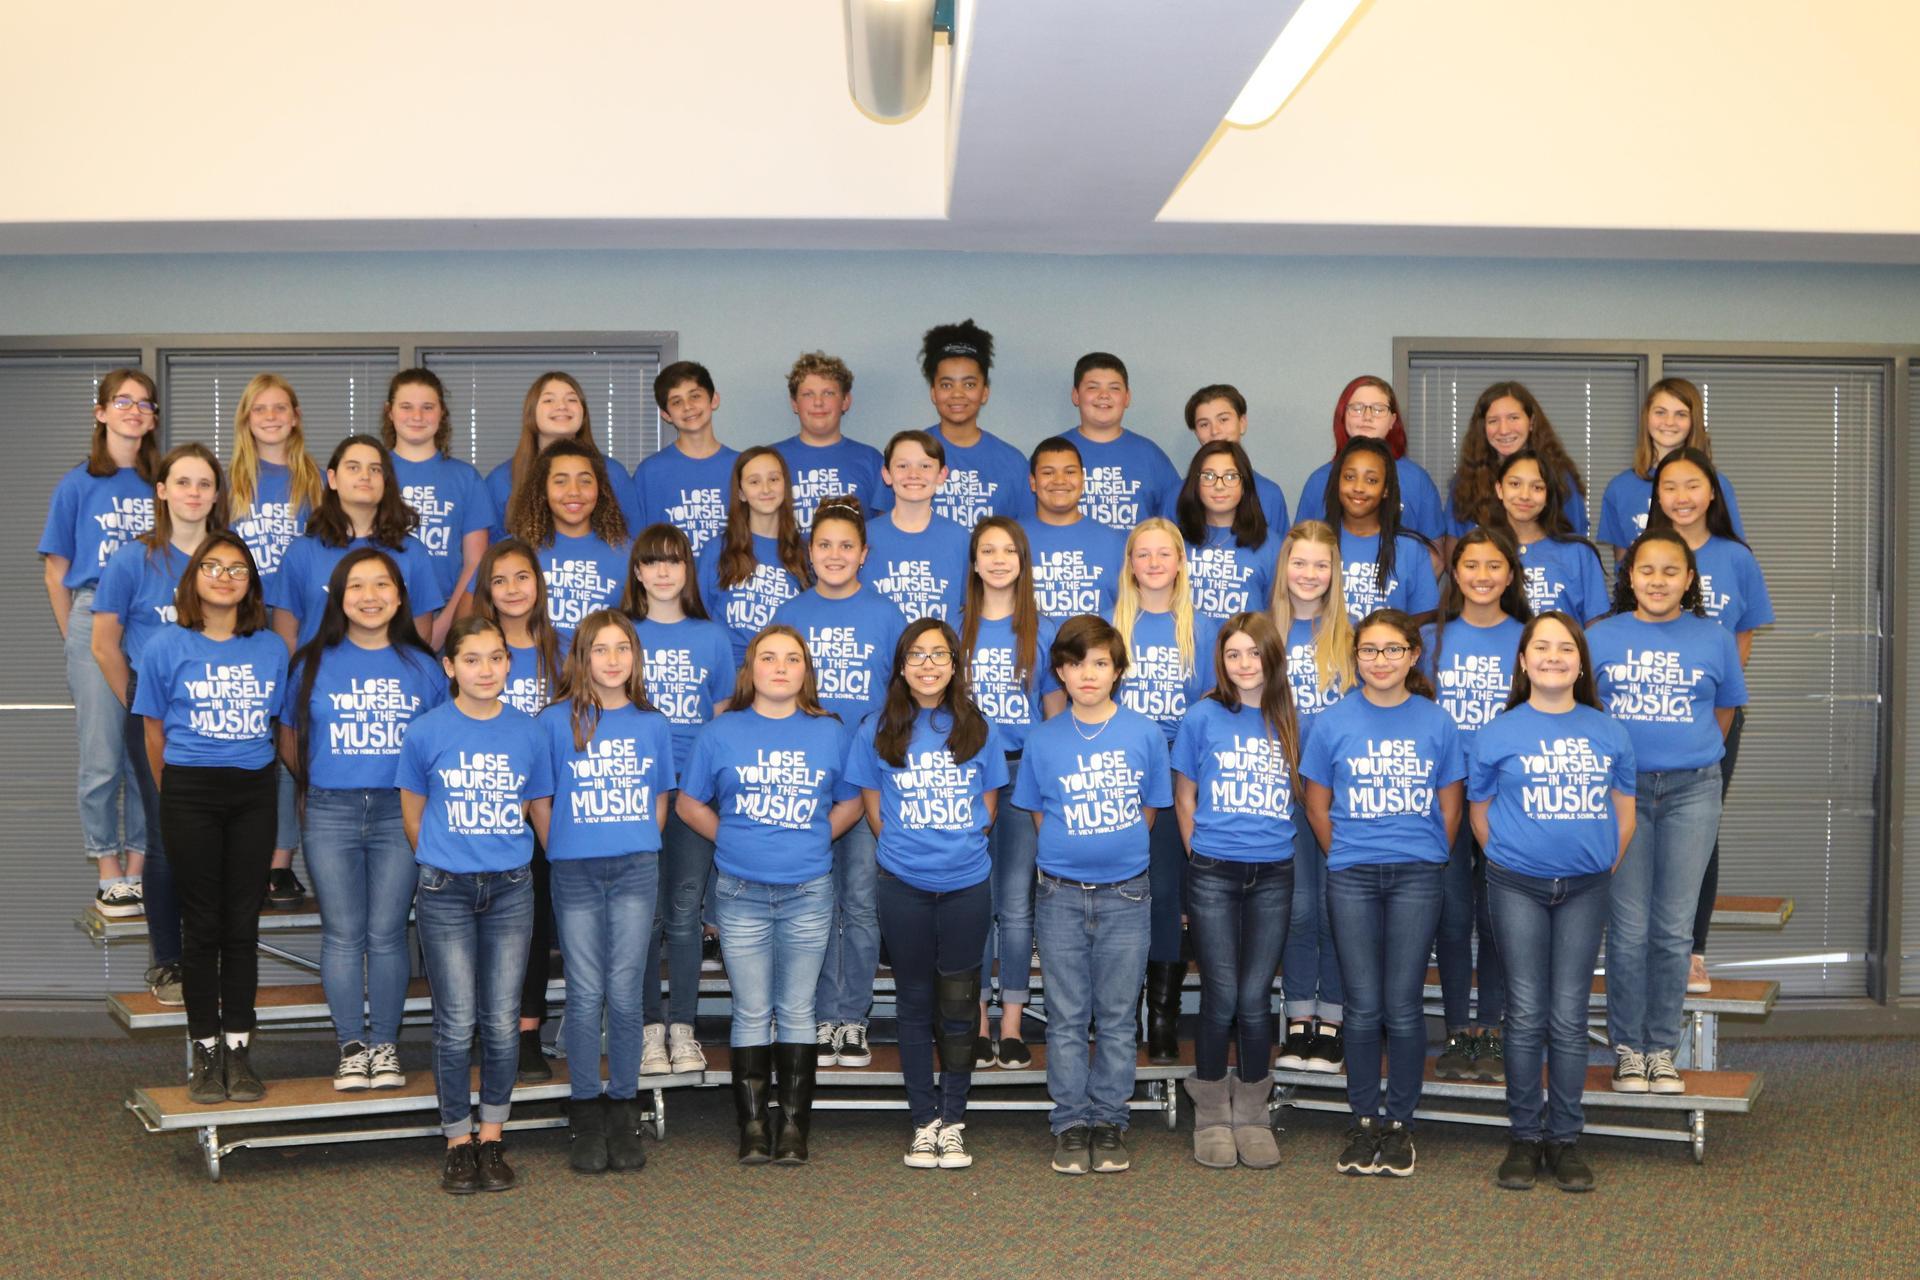 Choir group photo